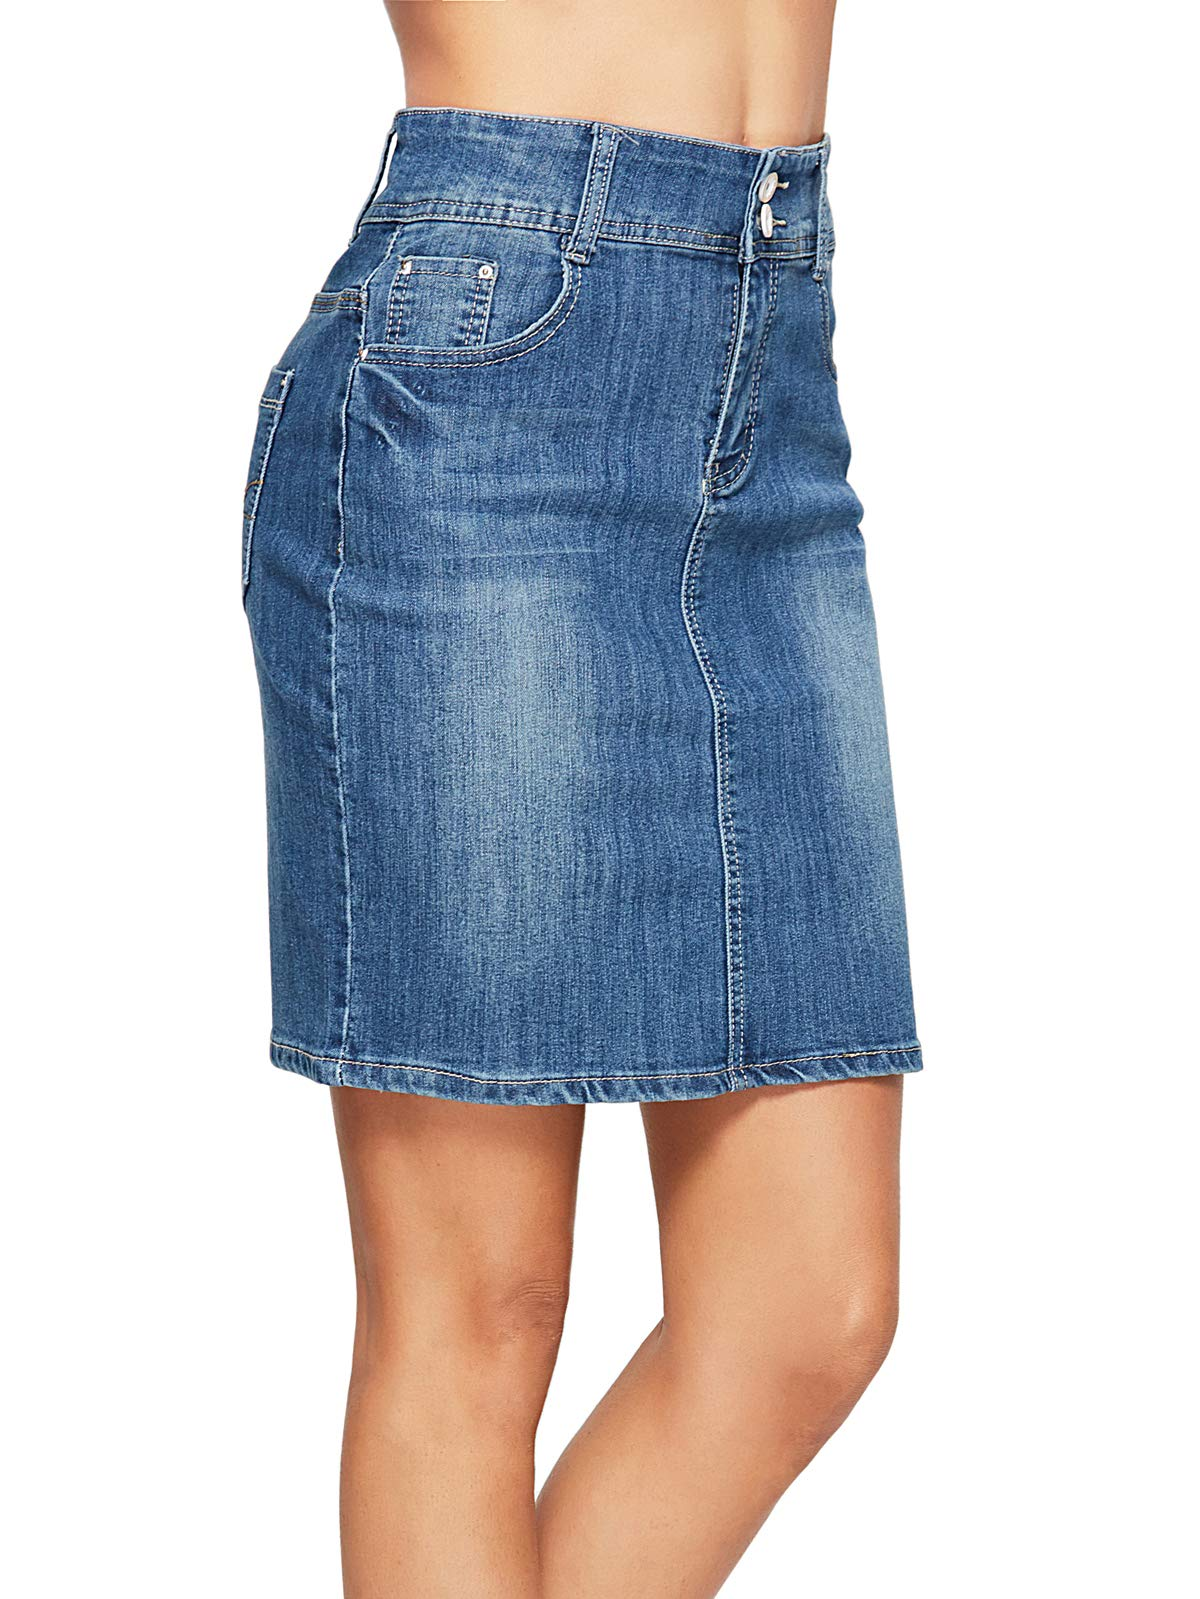 Beluring Womens Denim Jean Midi Pencil Fashion Skirts Knee Length Dark Blue Size 8